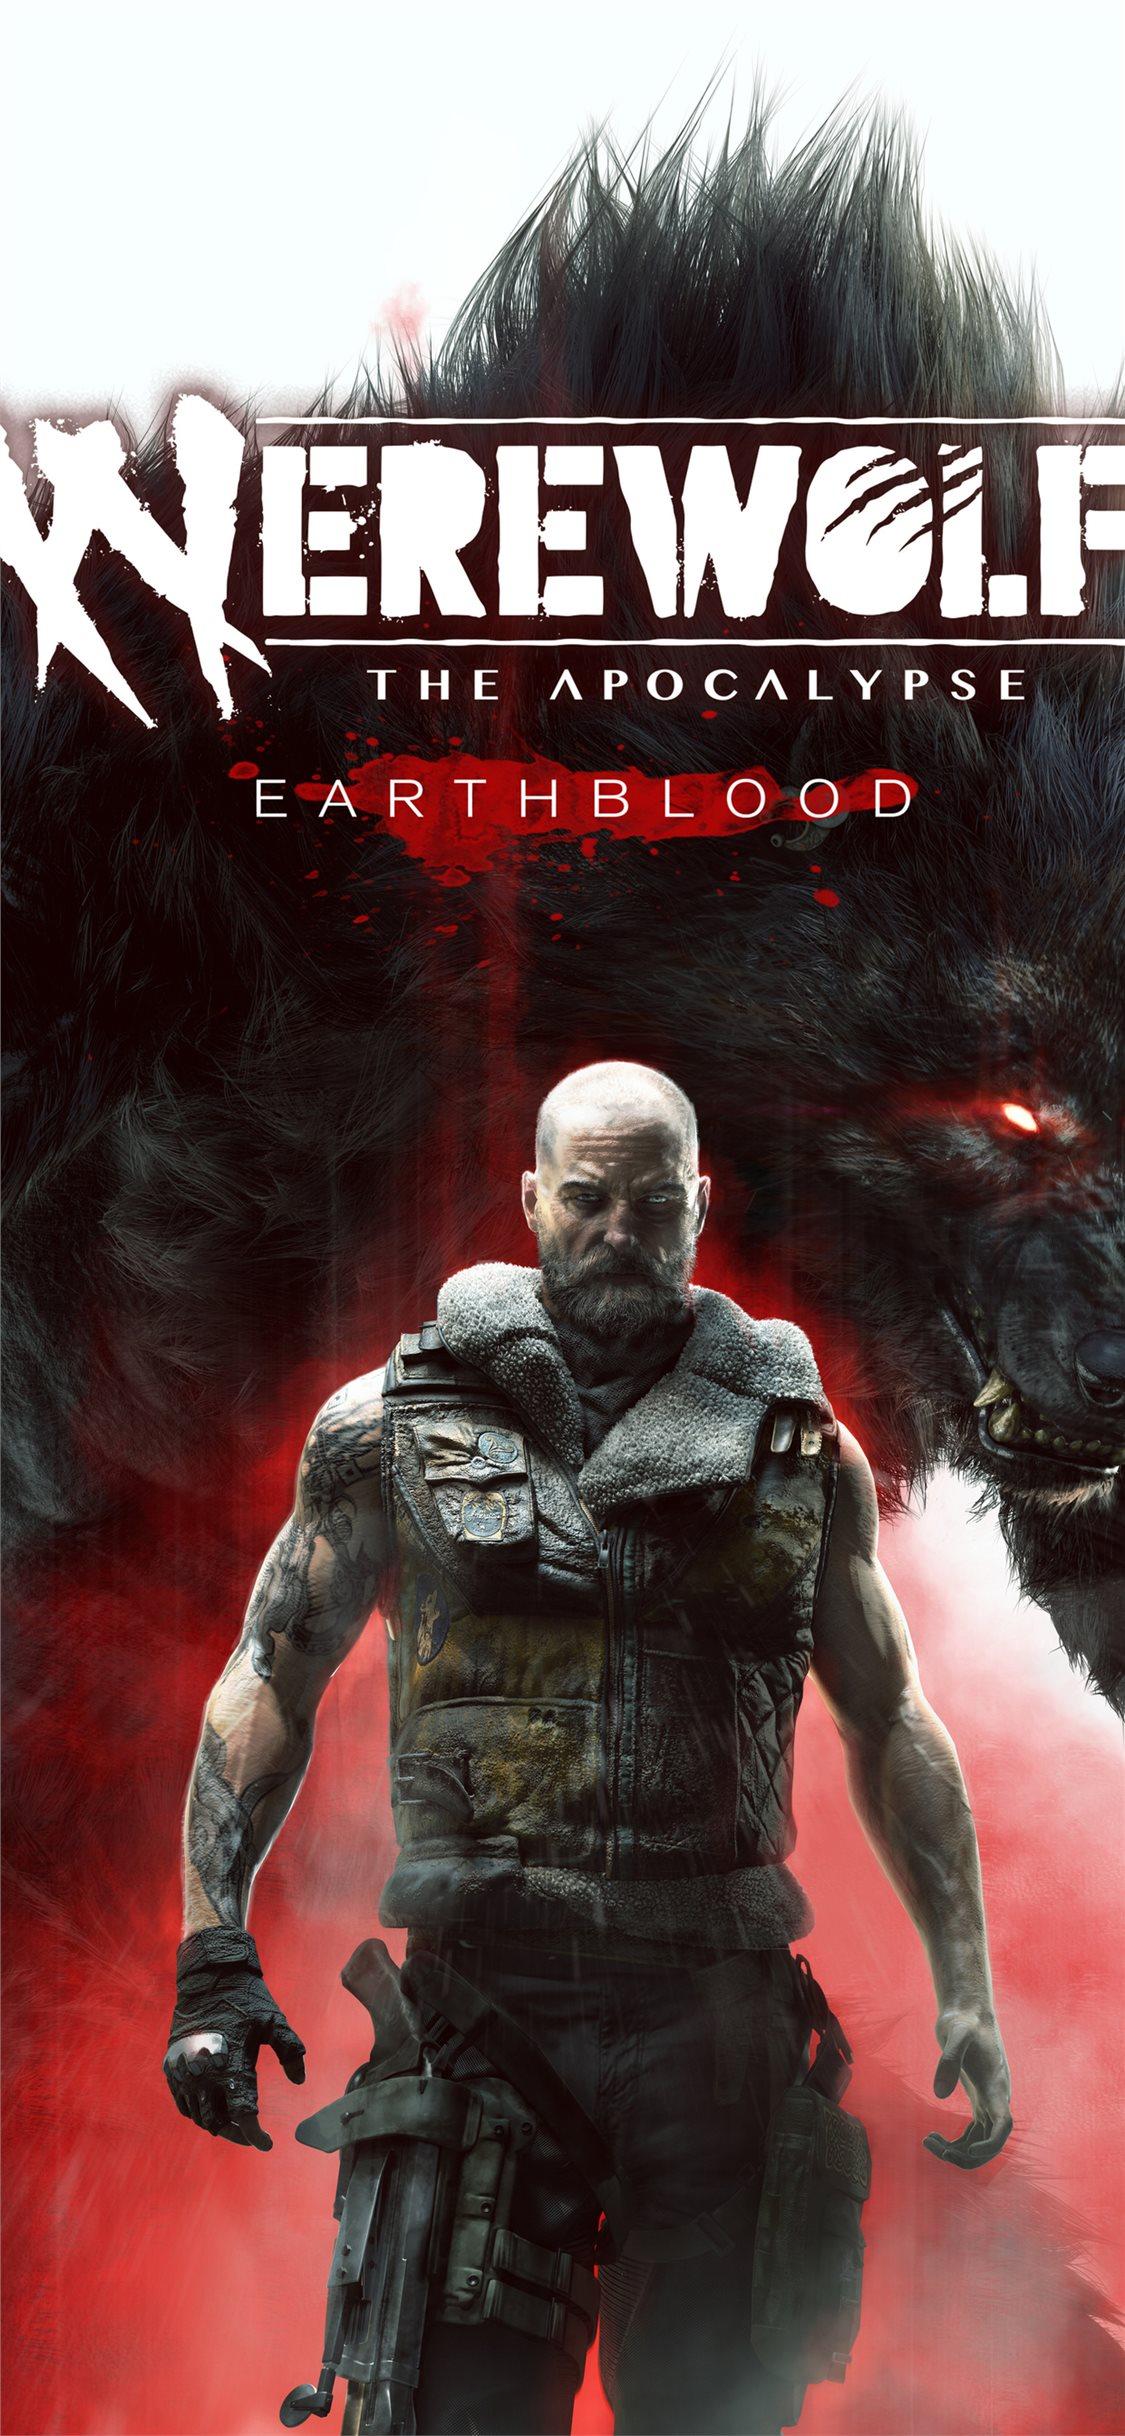 werewolf the apocalypse earthblood 2020 4k iPhone X Wallpapers 1125x2436